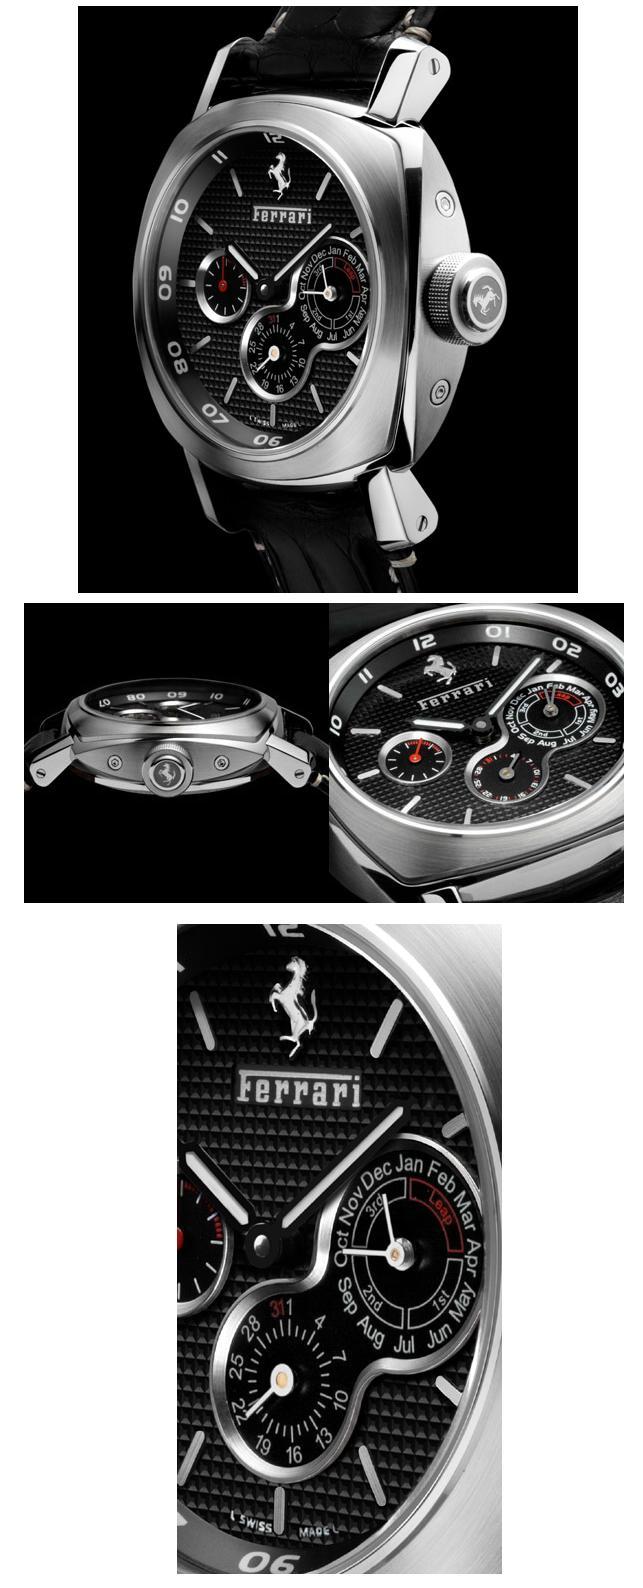 panerai - News : Panerai Calendrier Perpétuel pour Ferrari Qppan